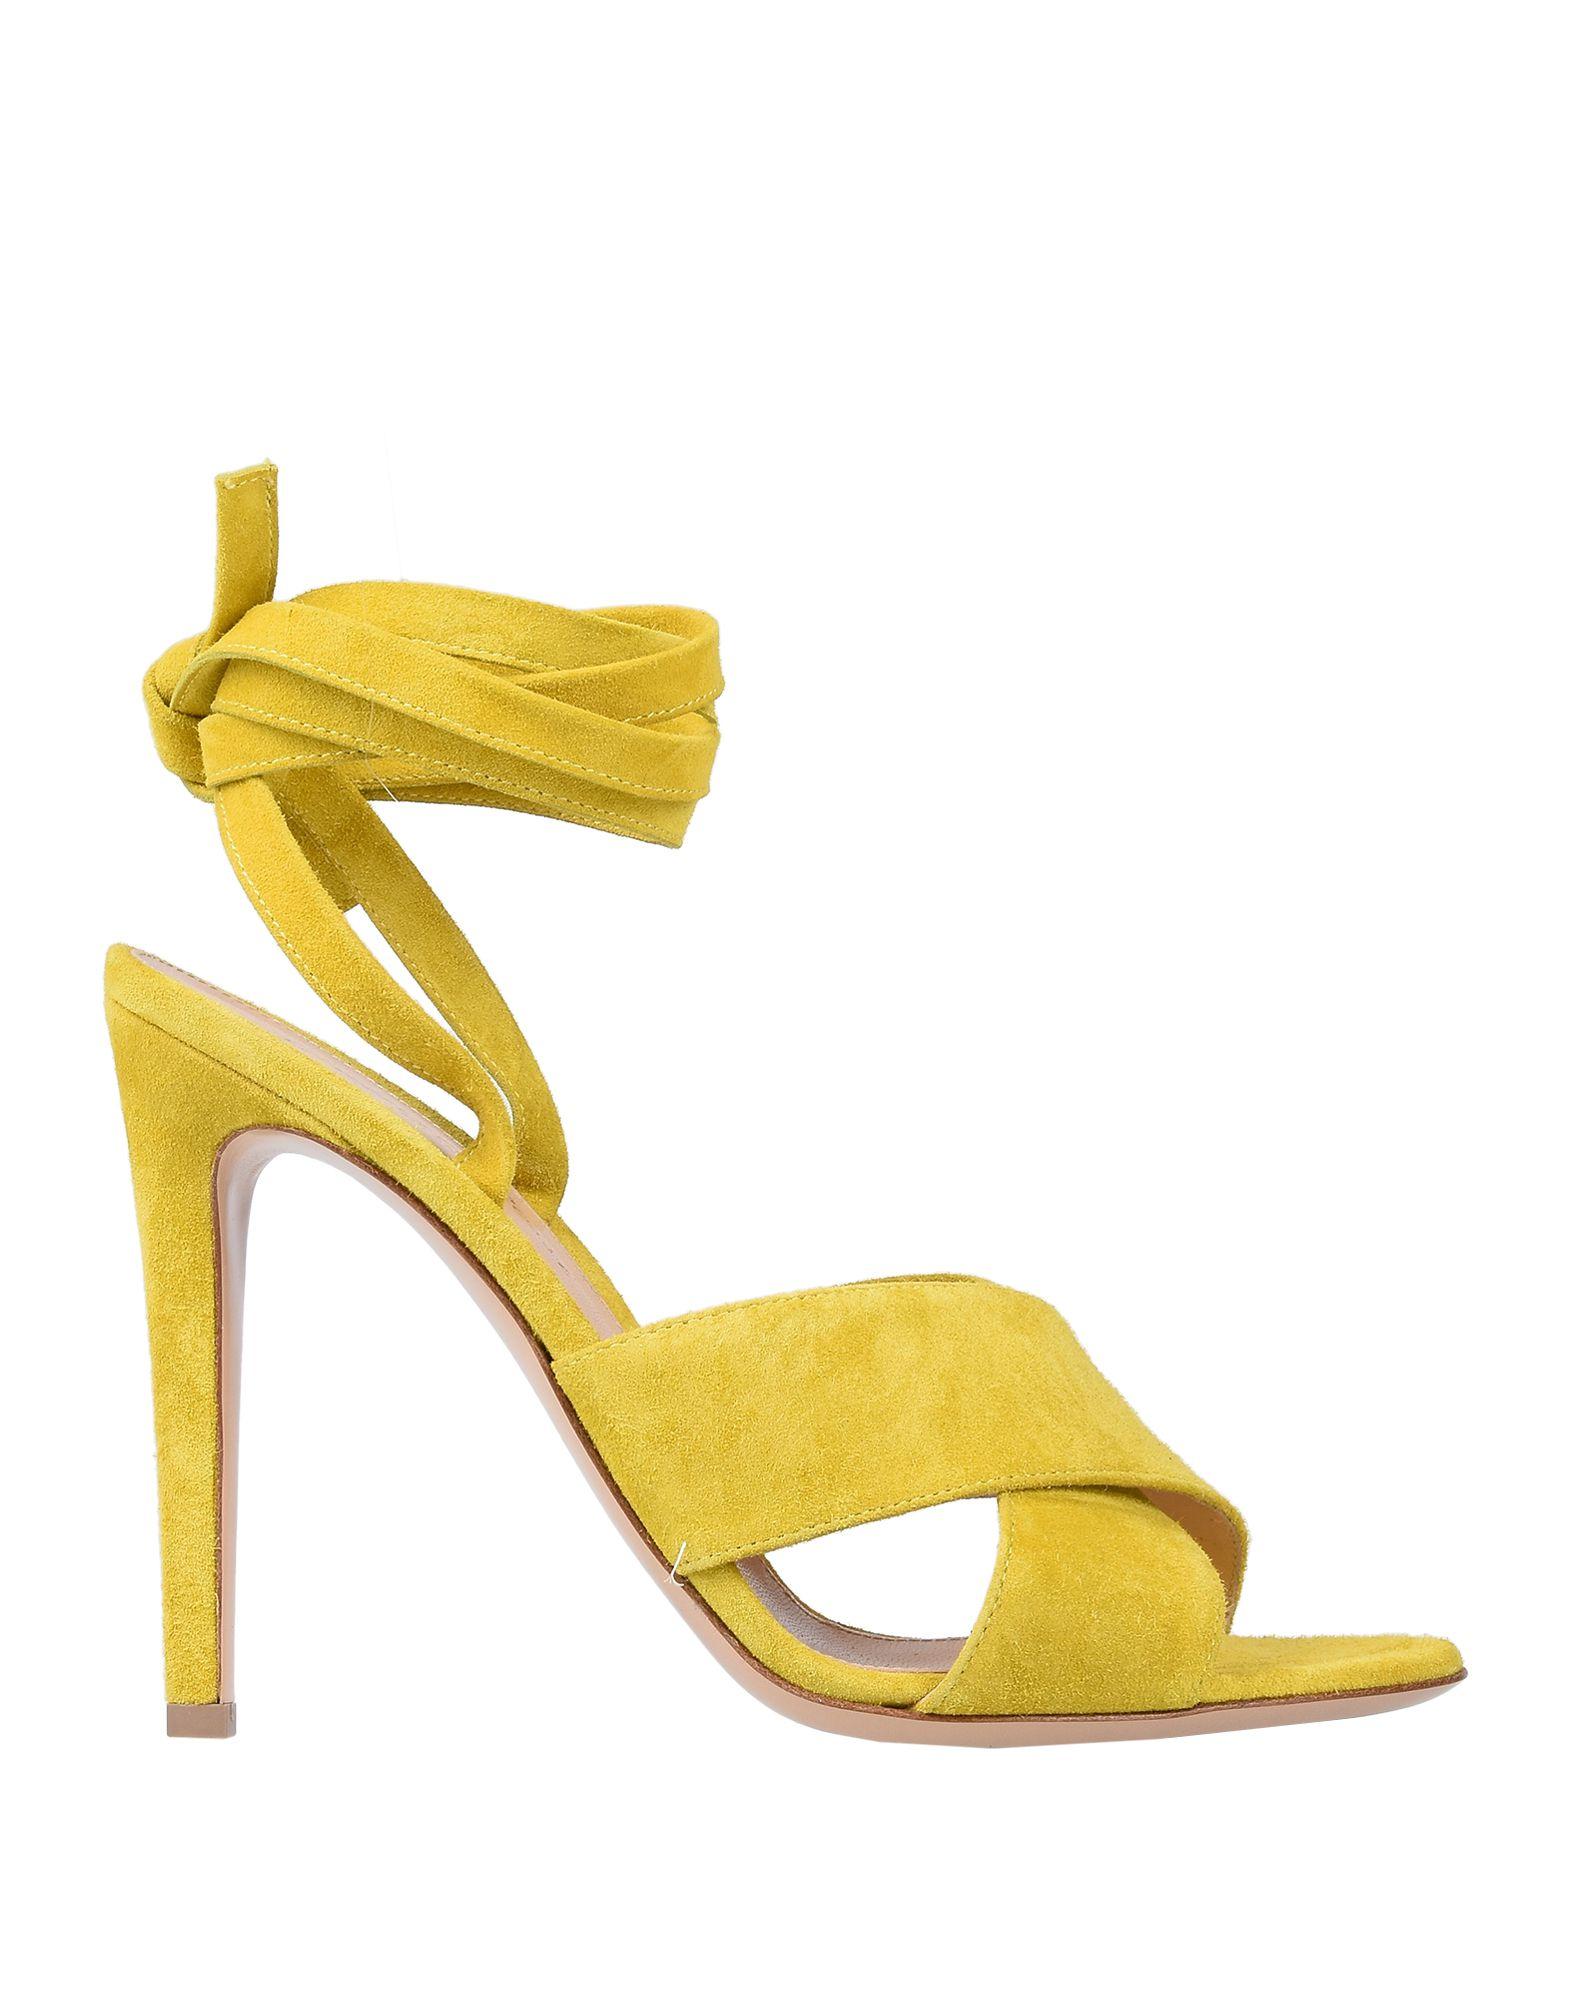 Gianvito Rossi Sandals In Yellow | ModeSens